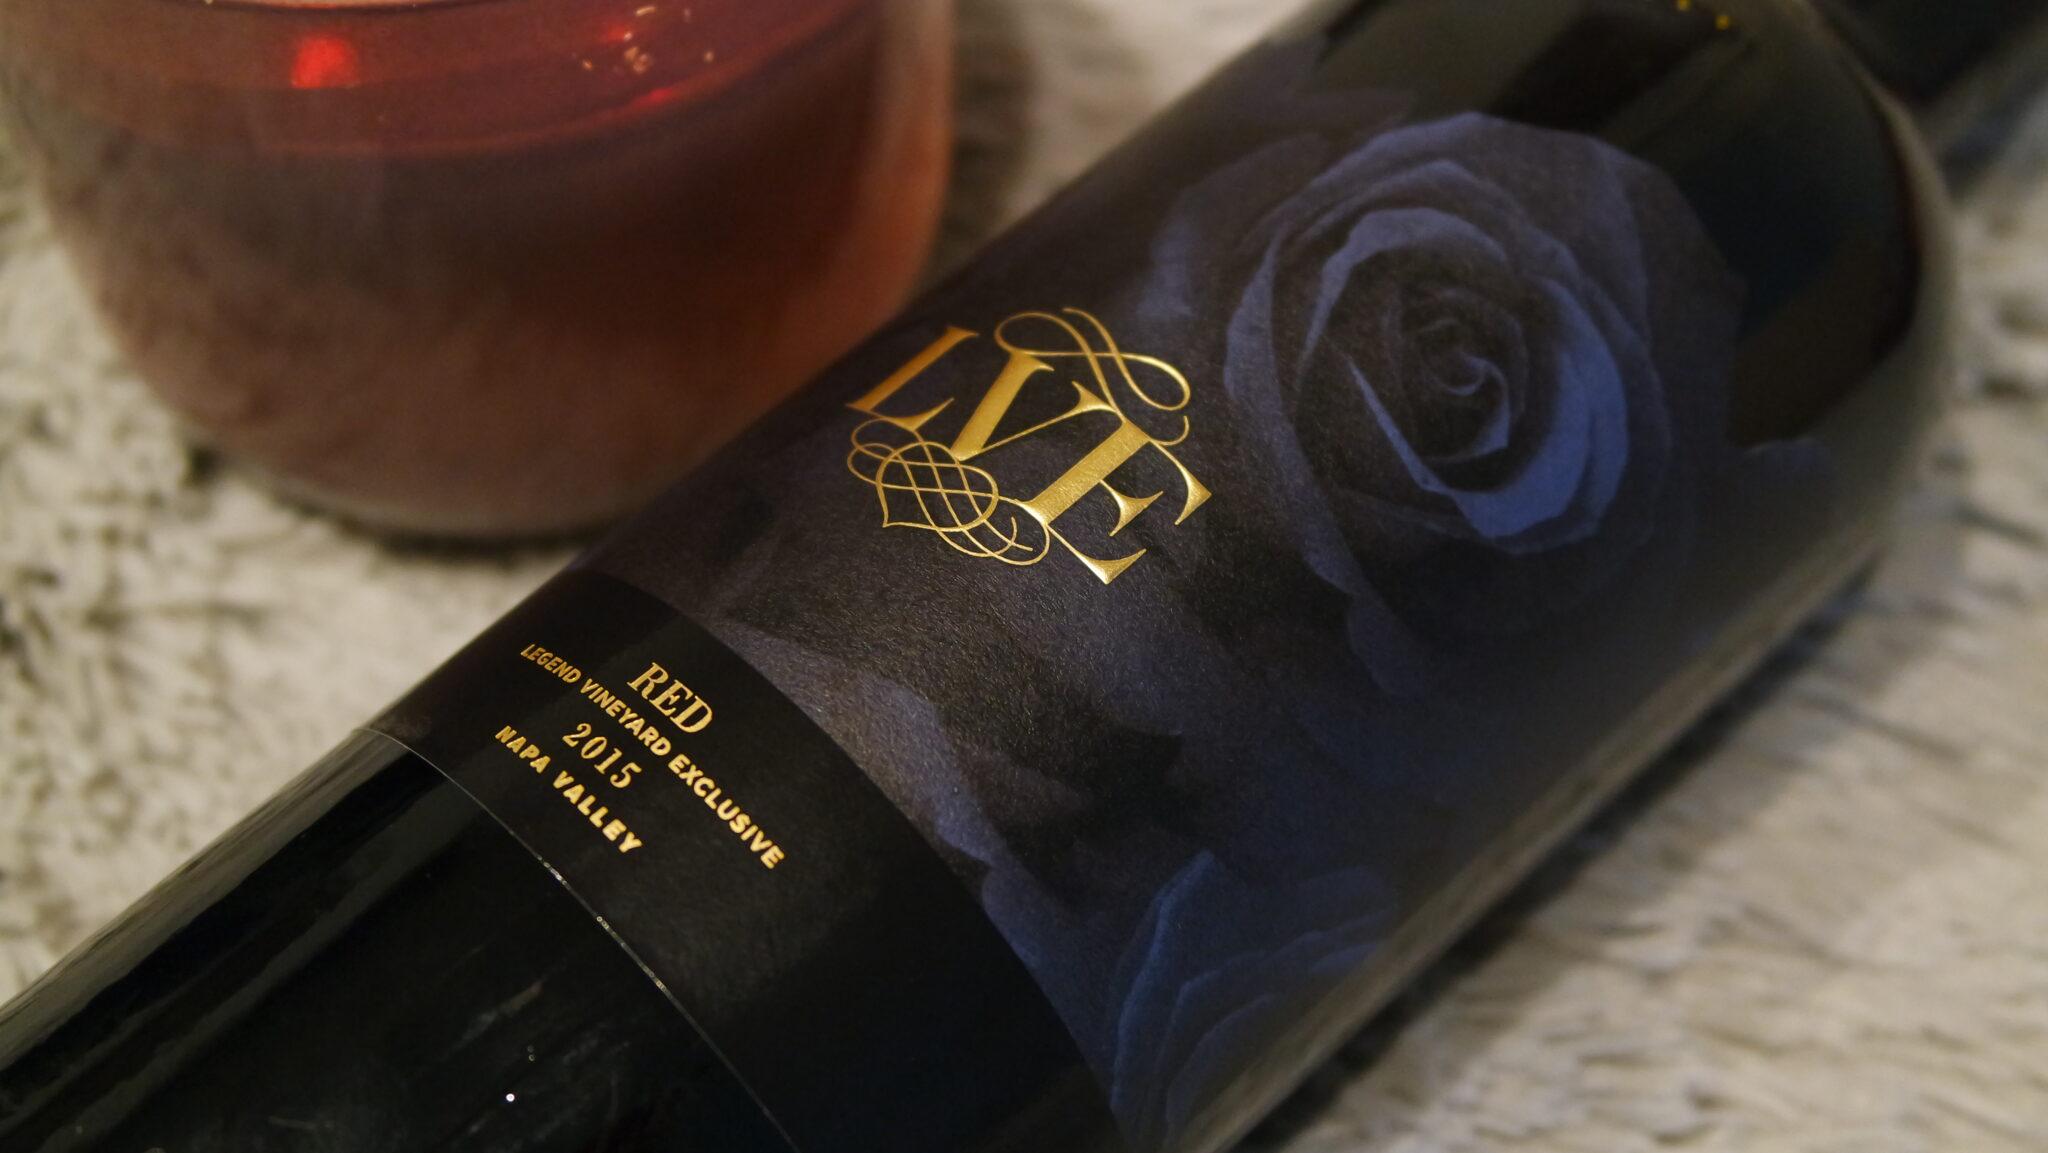 John Legend LVE Collection Wine